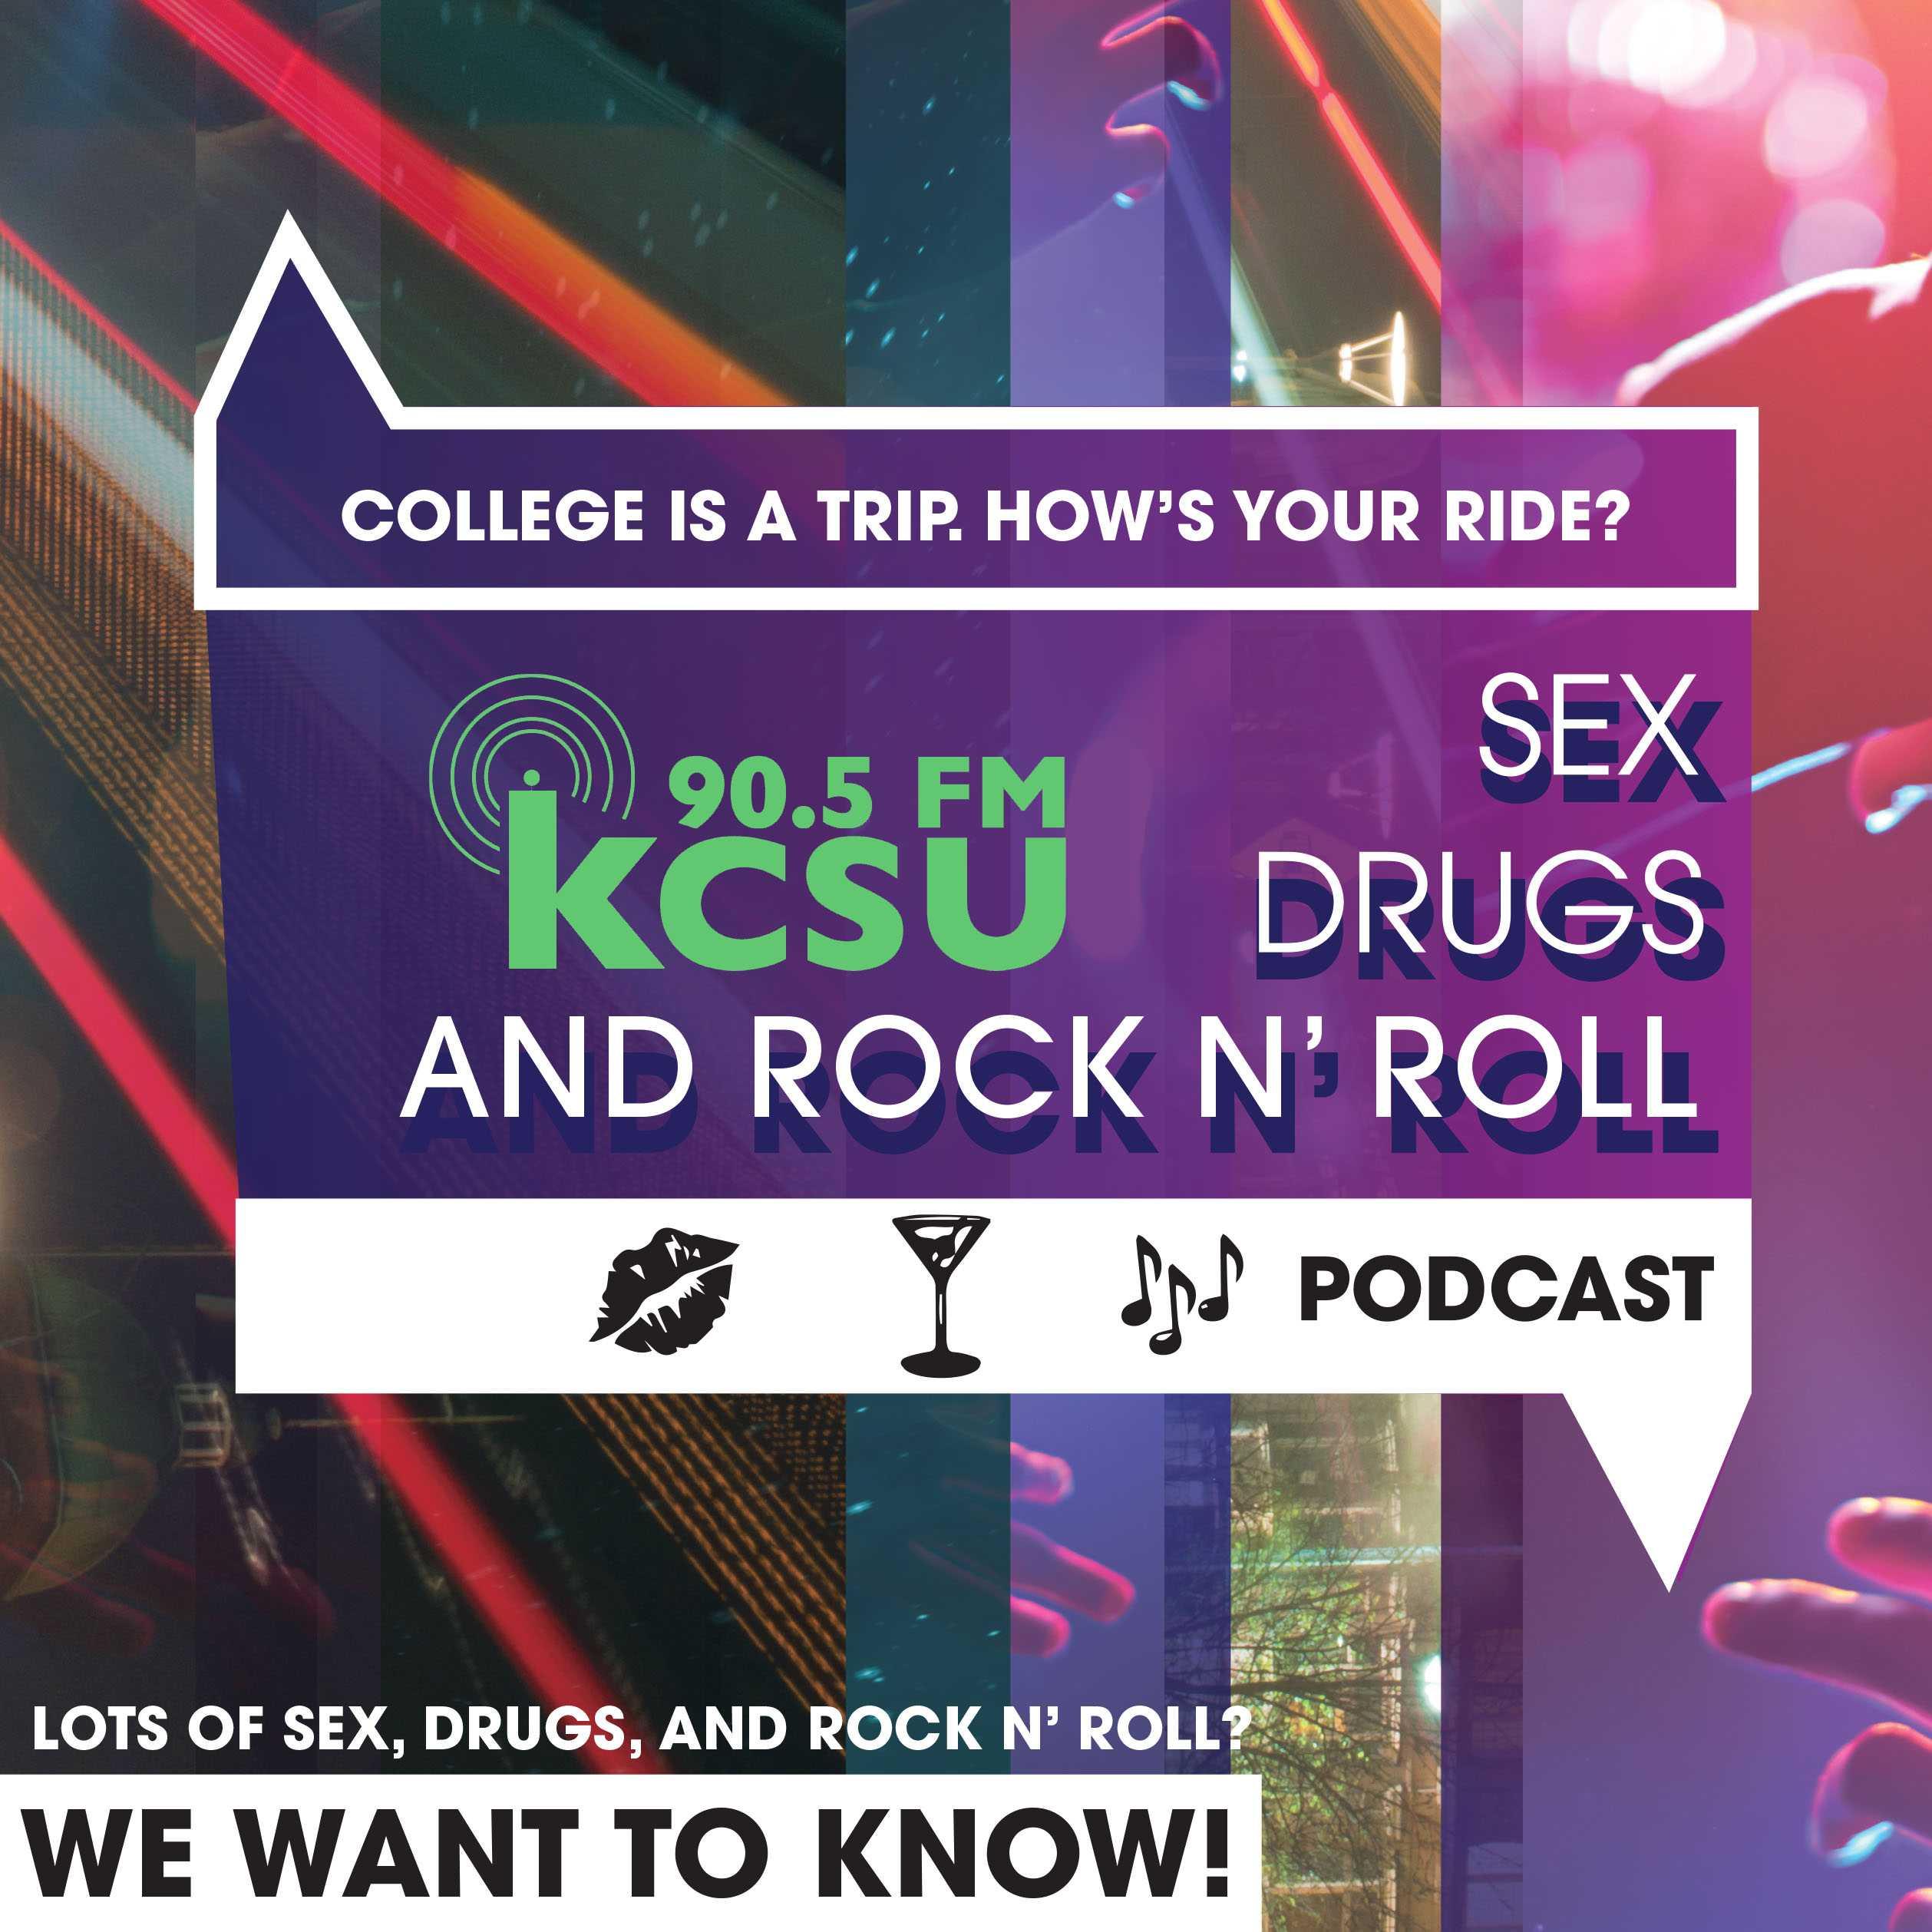 KCSU Sex, drugs and rock'n'roll